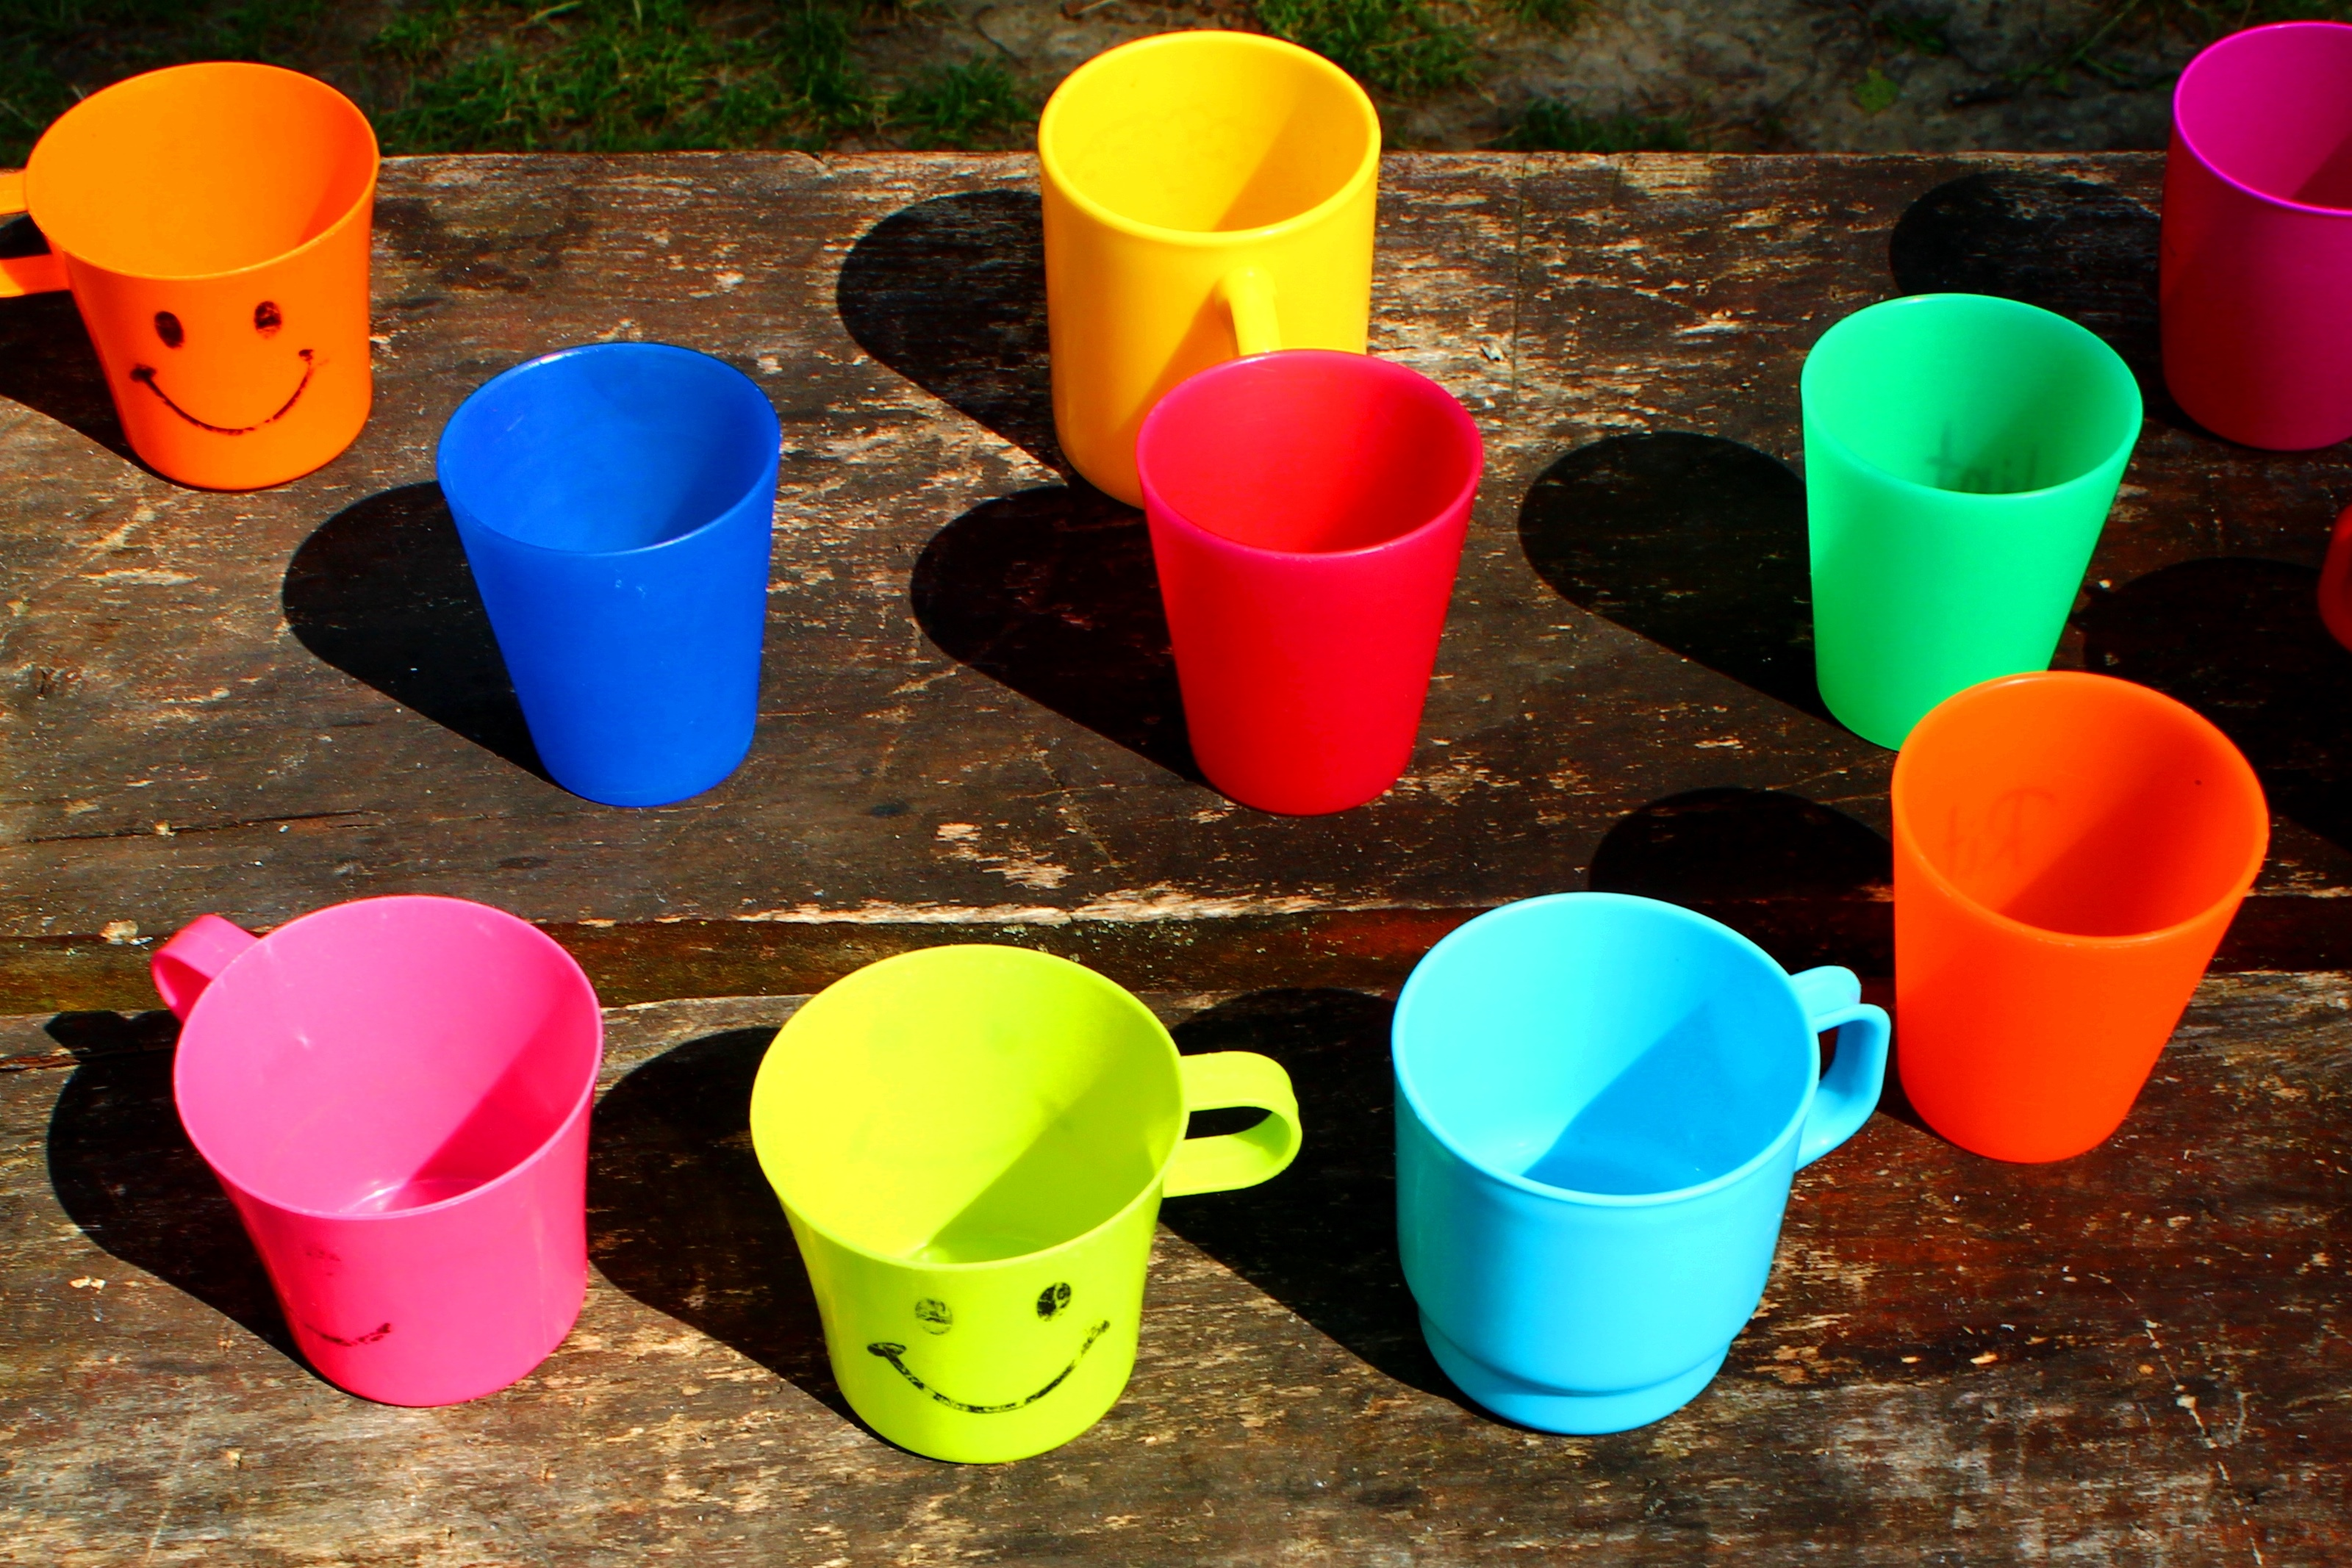 filecolorful plastic cups and mugsjpg - Colorful Mugs